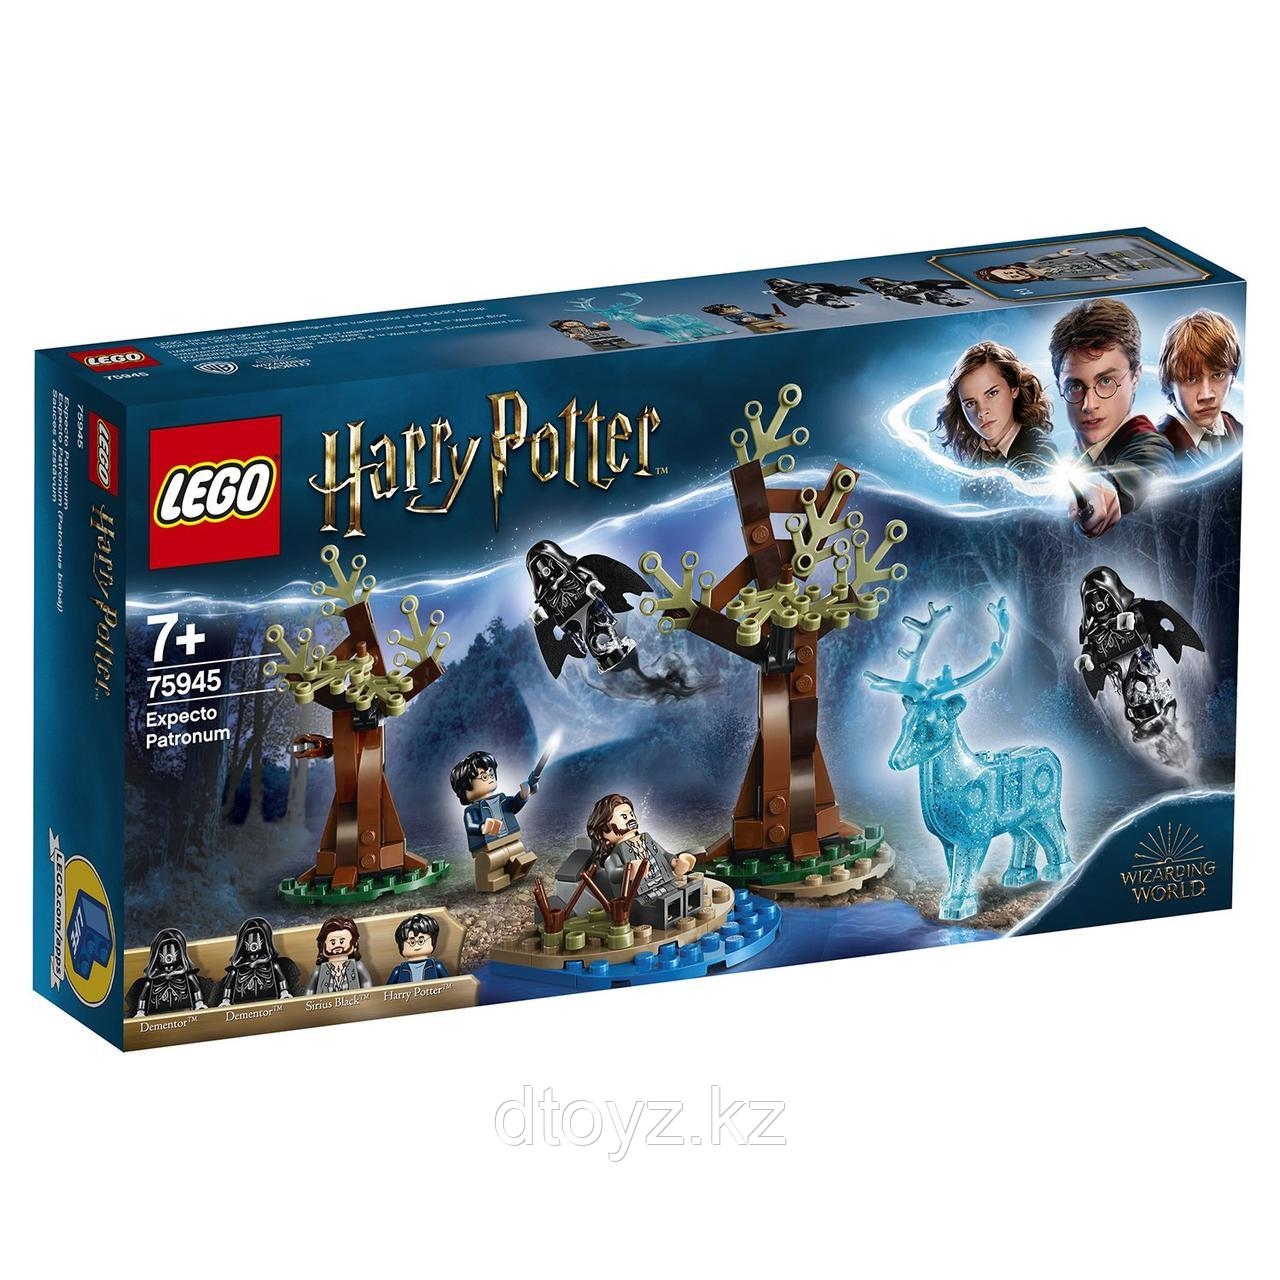 Lego Harry Potter 75945 Экспекто Патронум!, Лего Гарри Поттер